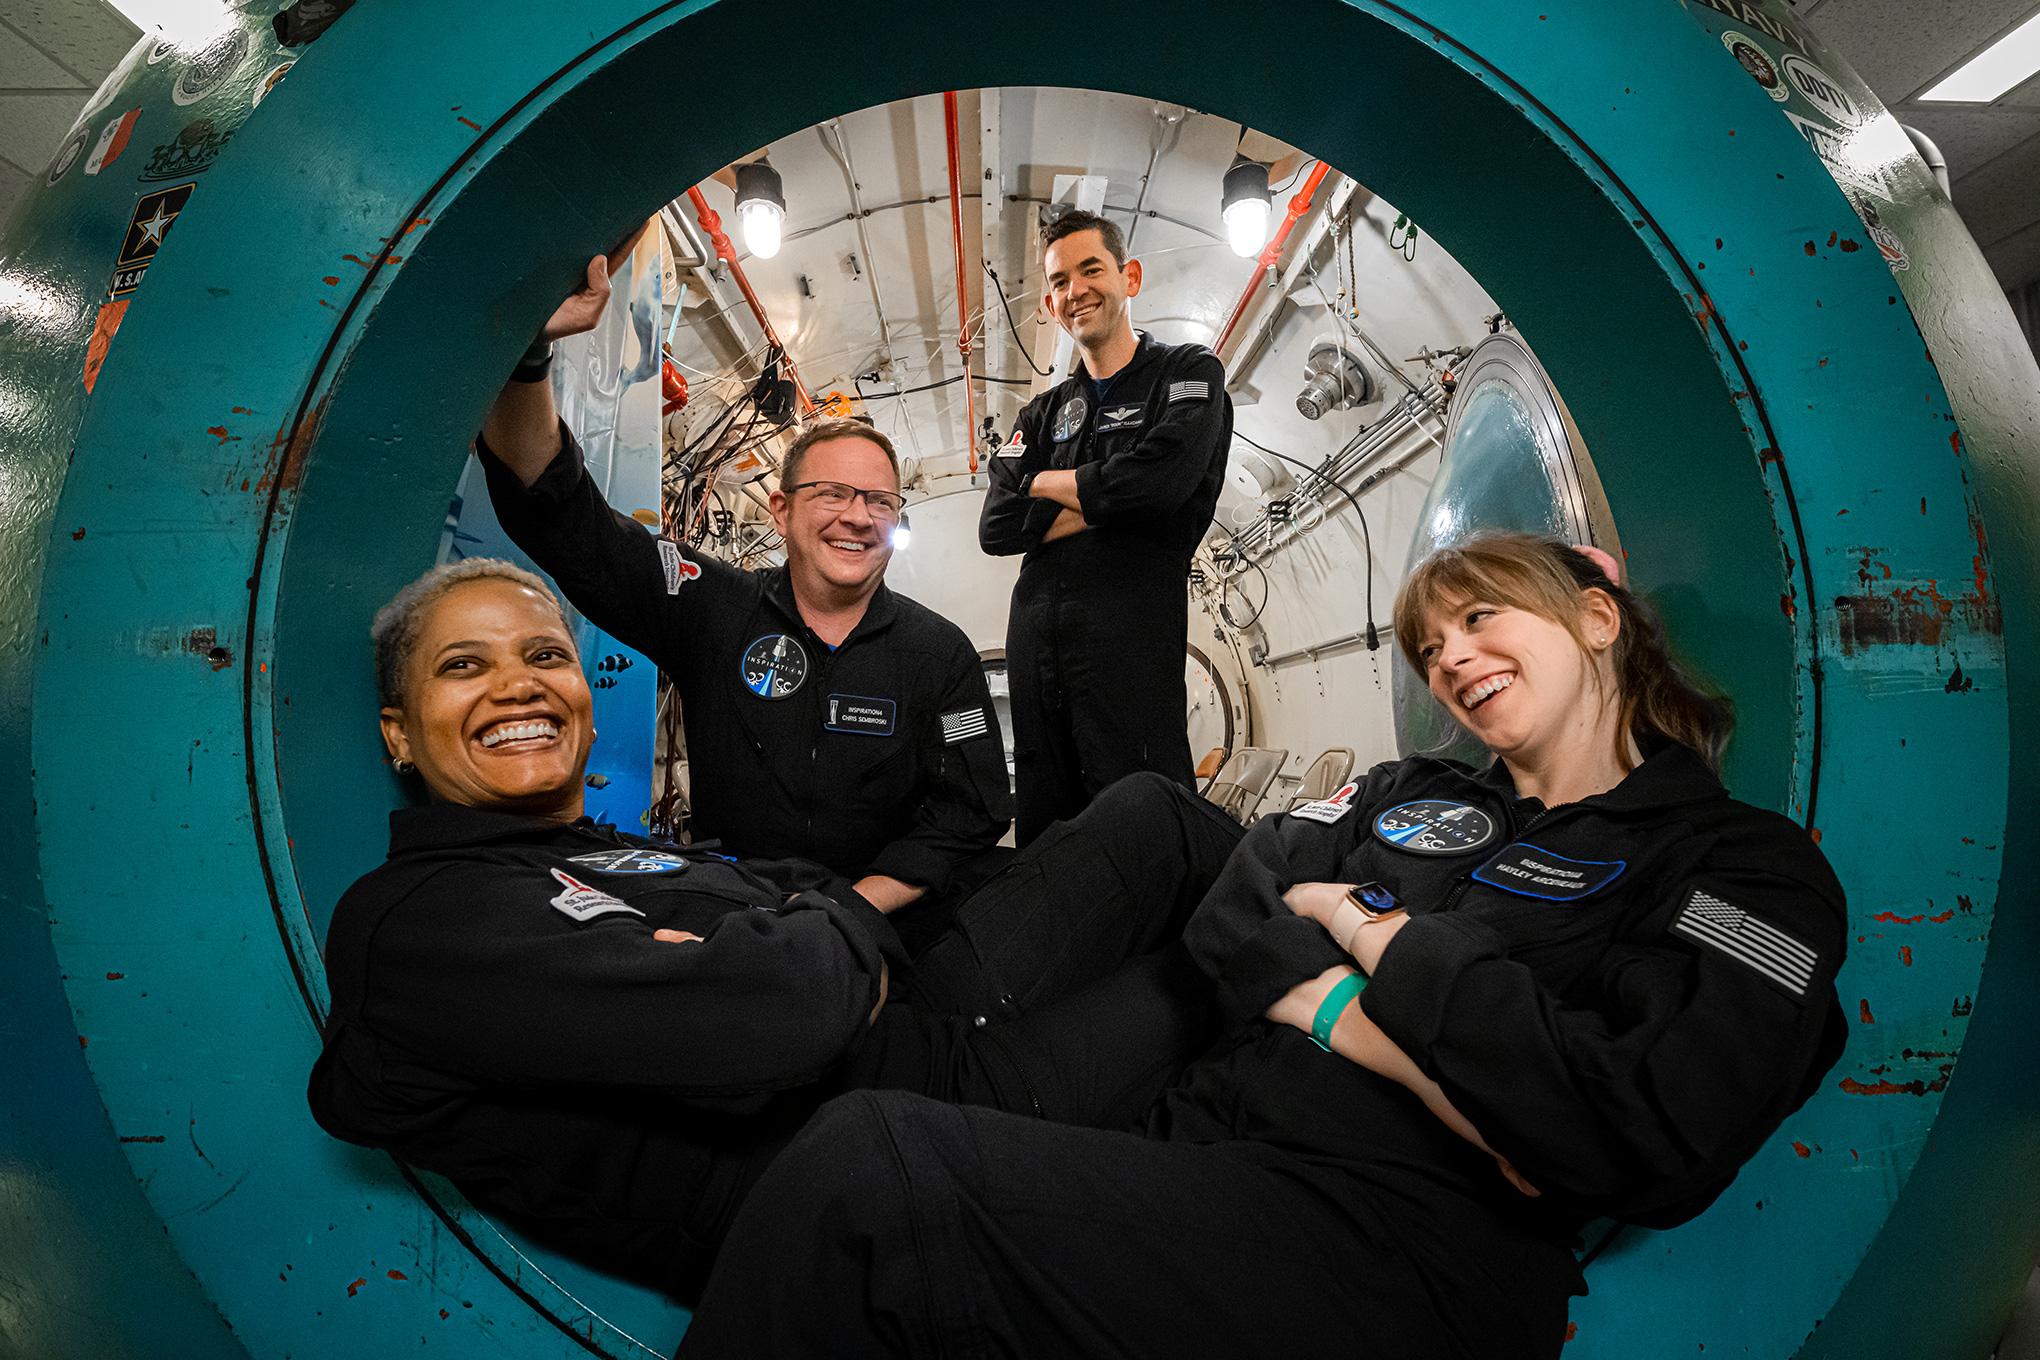 The Inspiration4 crew at Duke Health in Durham, North Carolina on July 2, 2021.